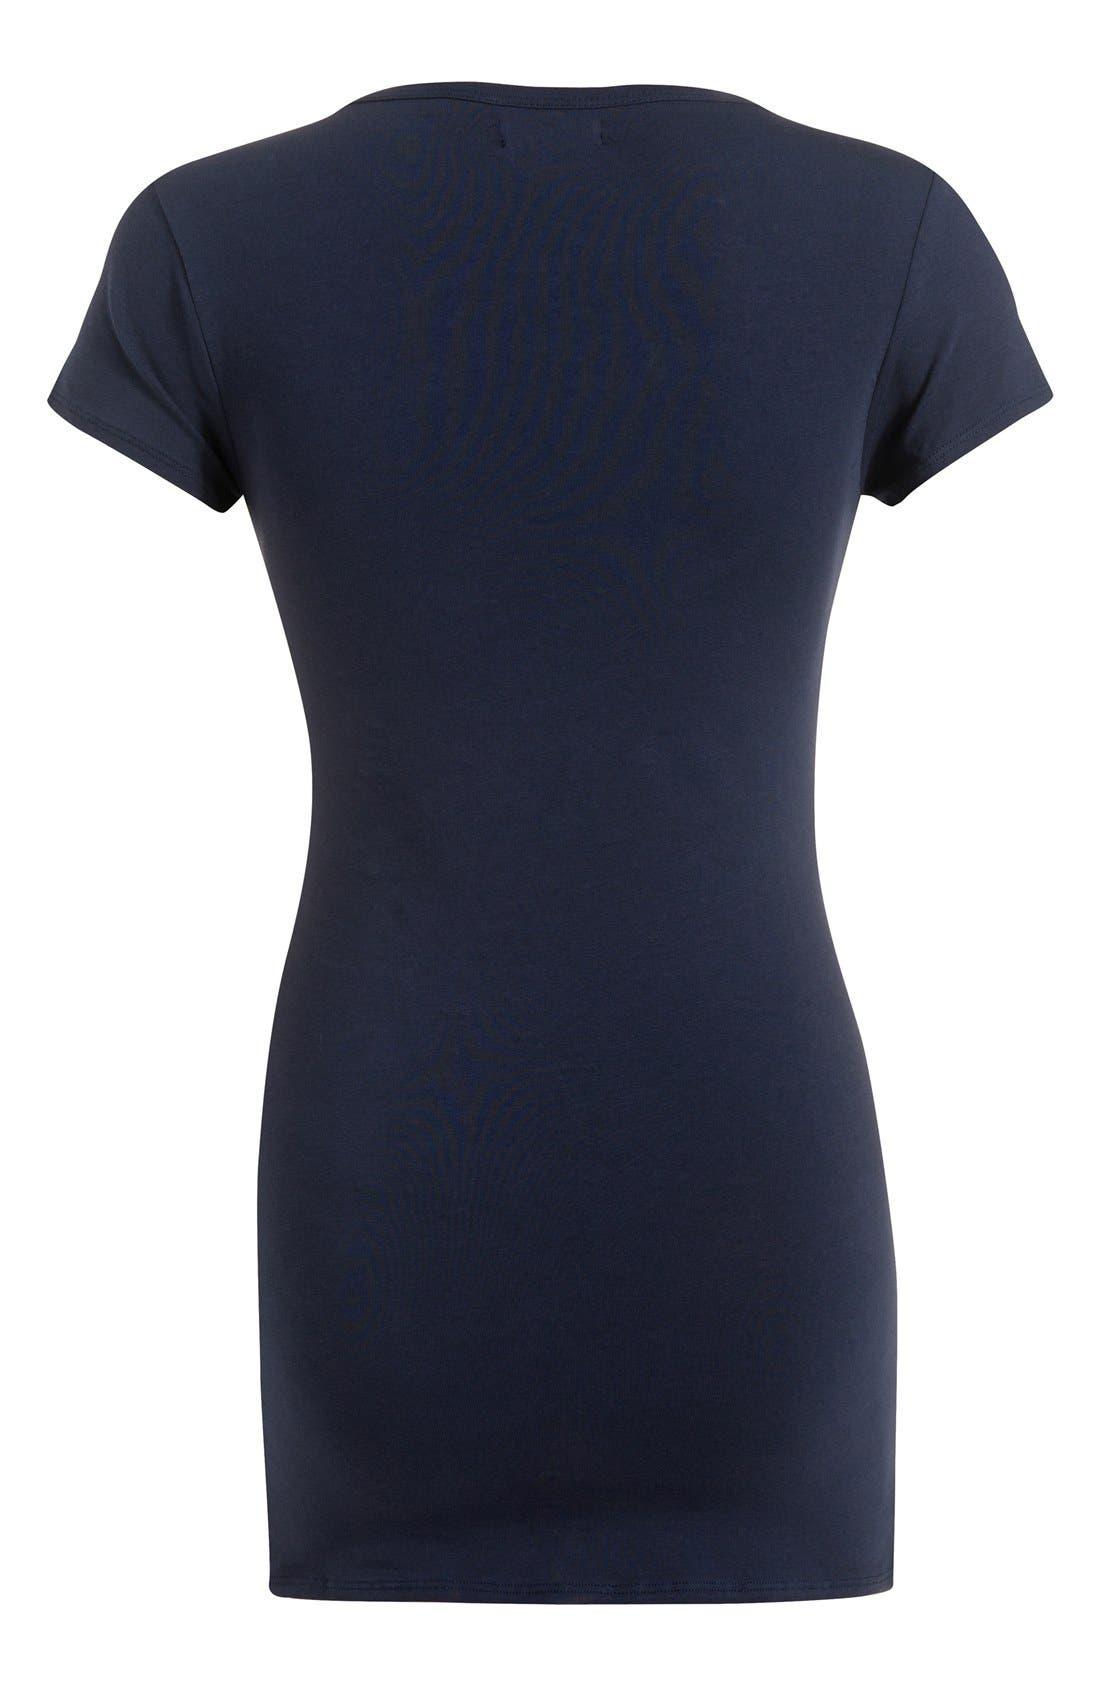 Alternate Image 2  - Noppies 'Elise' Stretch Jersey Maternity/Nursing Top